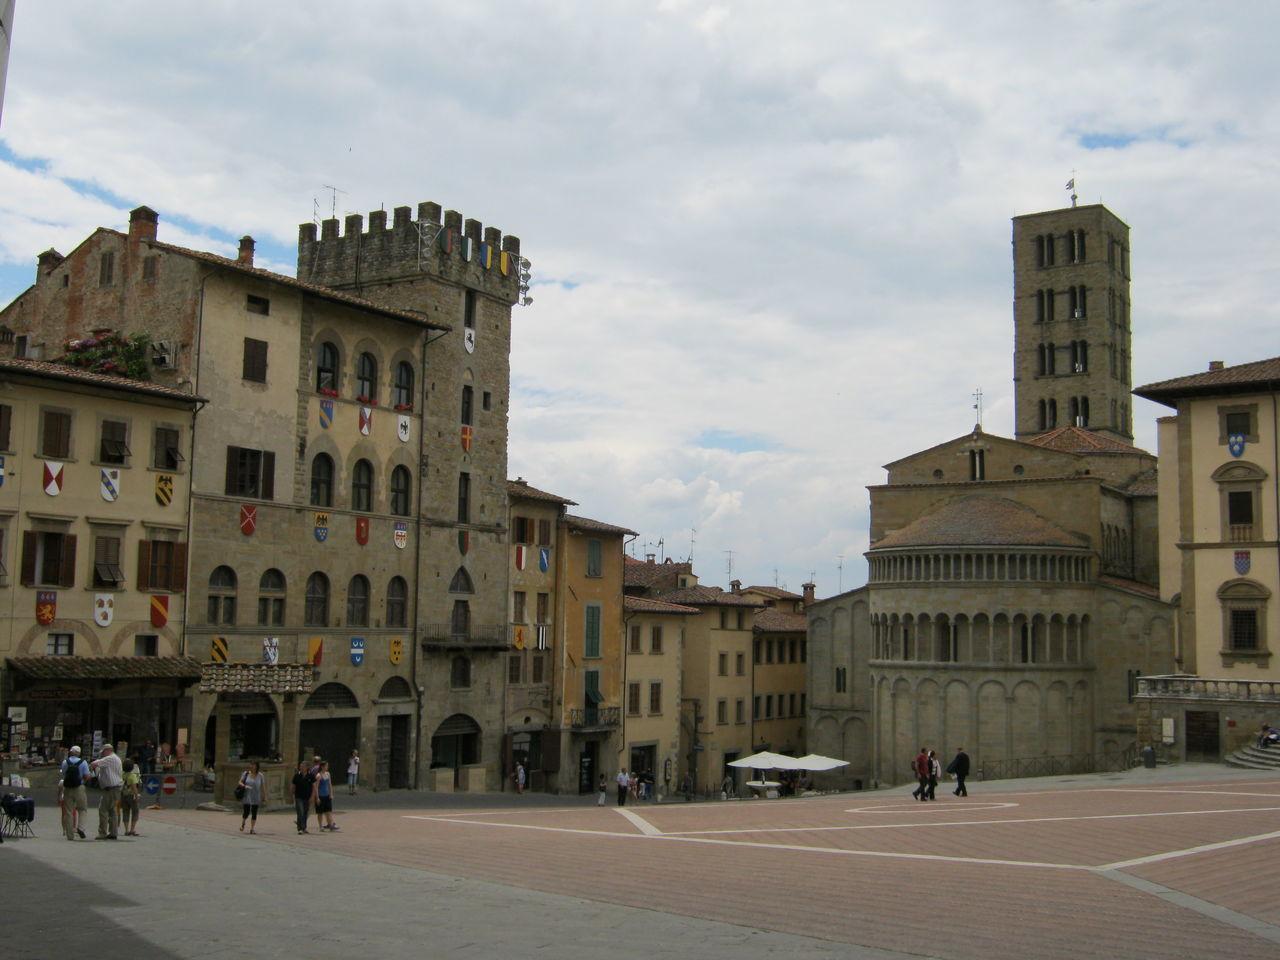 Arezzo, giugno 2011 Architecture Arezzo Building Exterior Built Structure City Cloud - Sky Day Outdoors Sky Travel Destinations